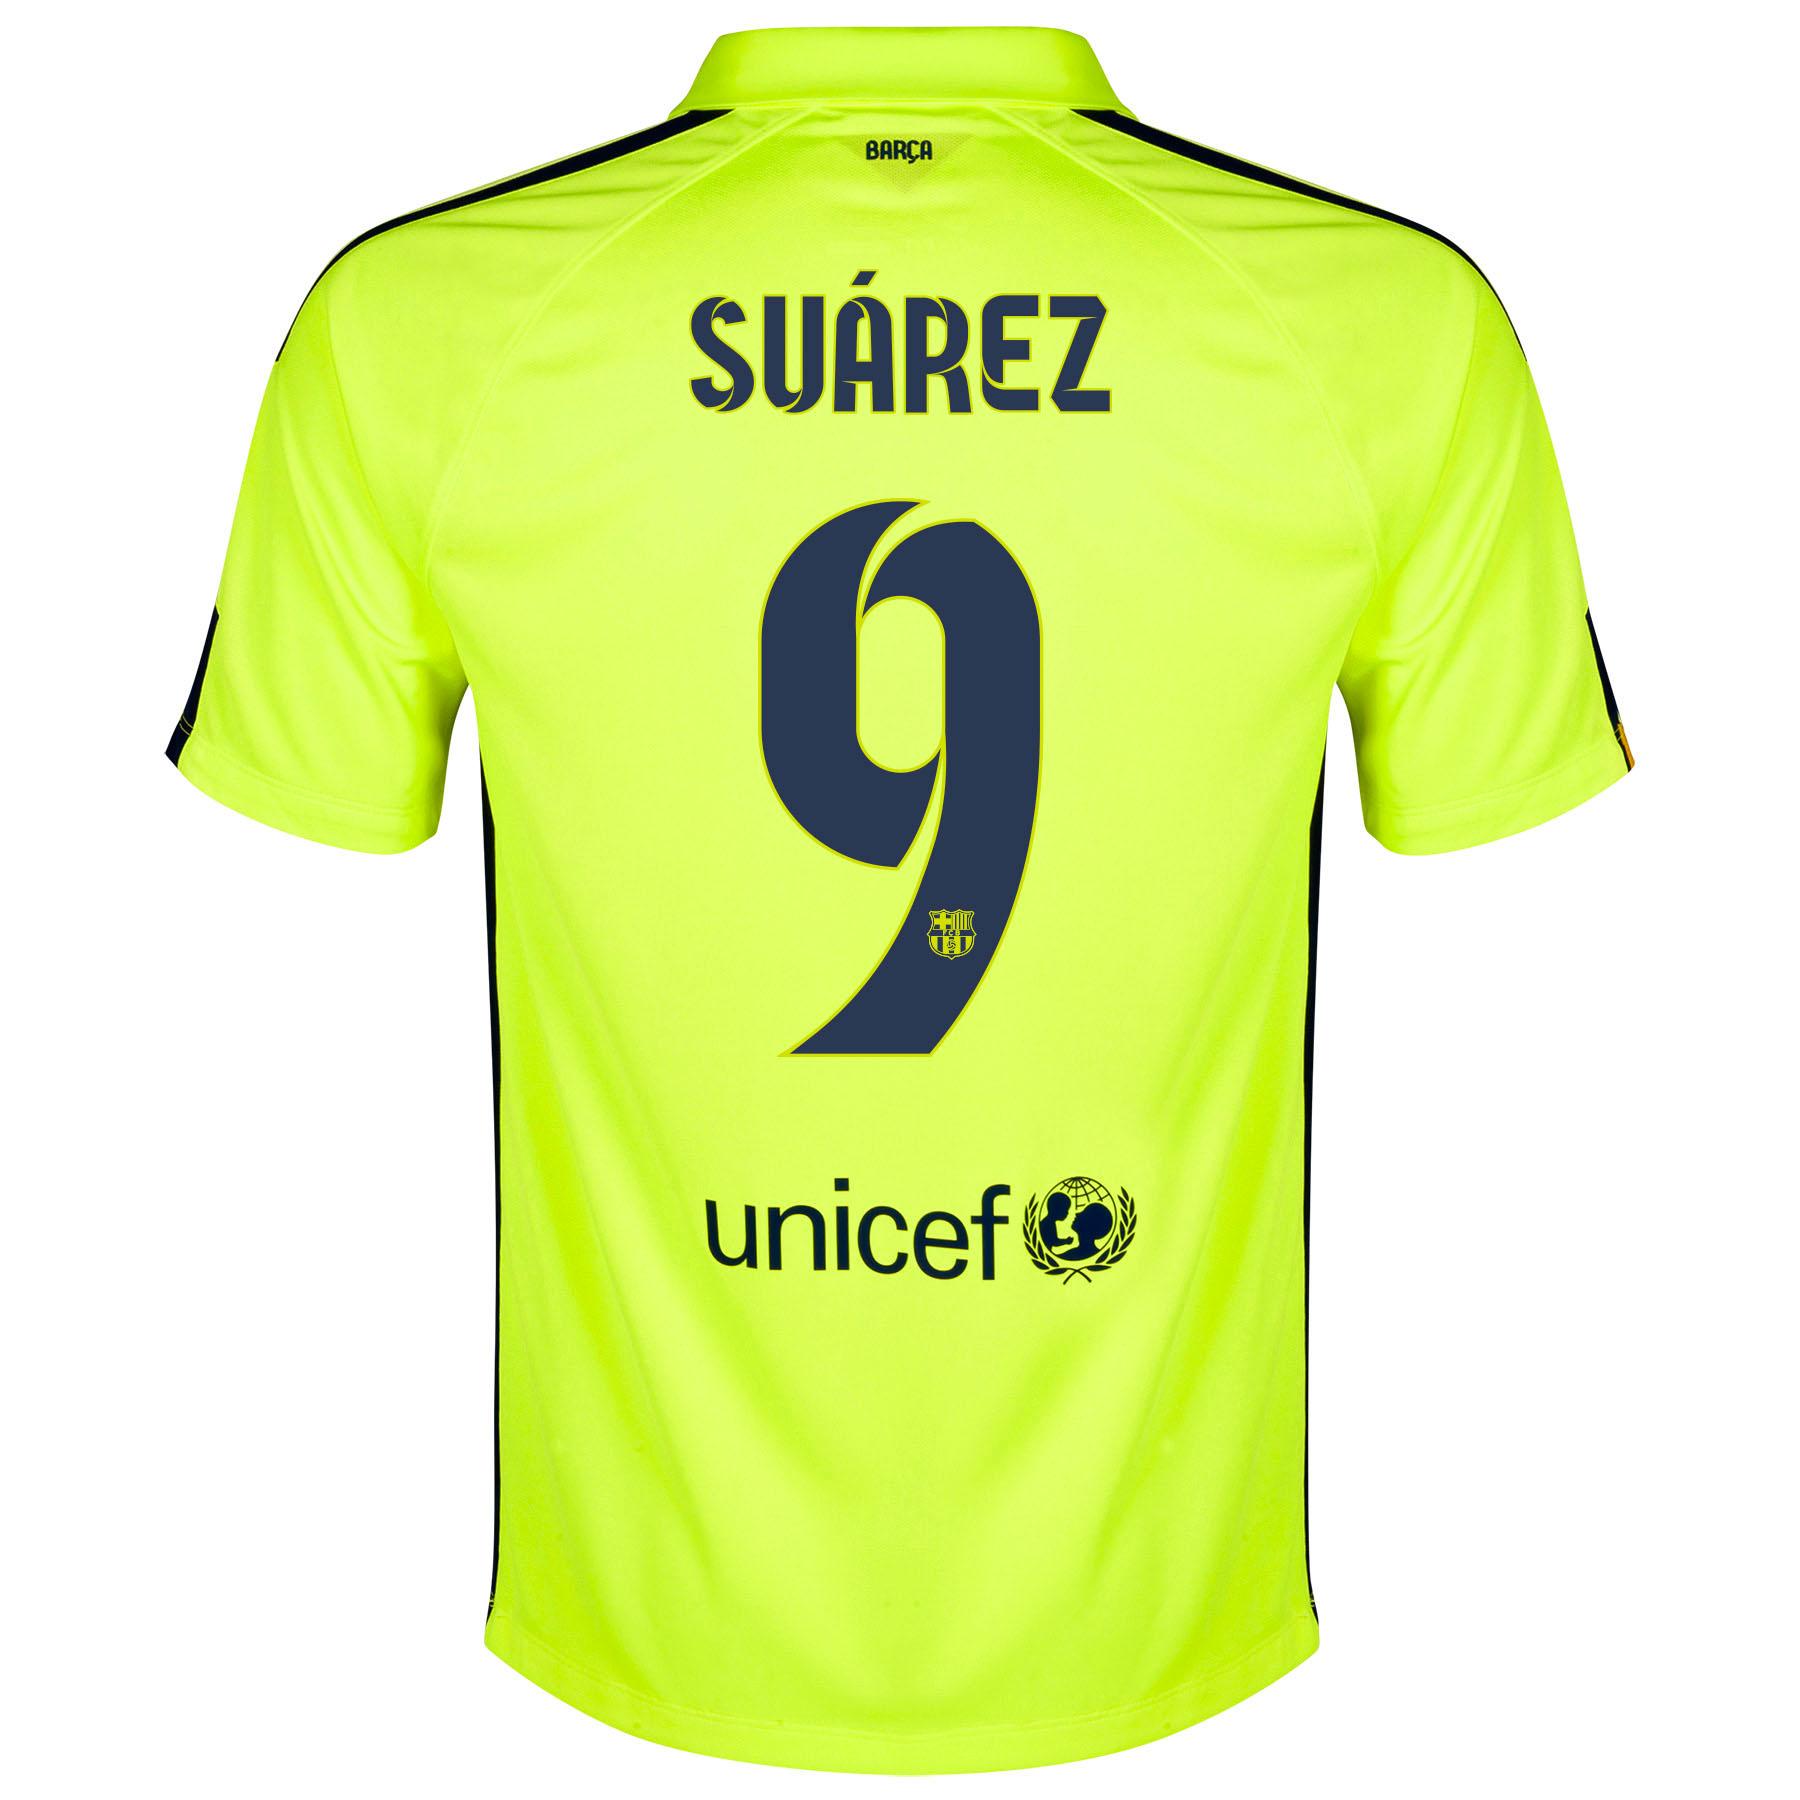 Barcelona Third Shirt 2014/15 Yellow with Suárez 9 printing